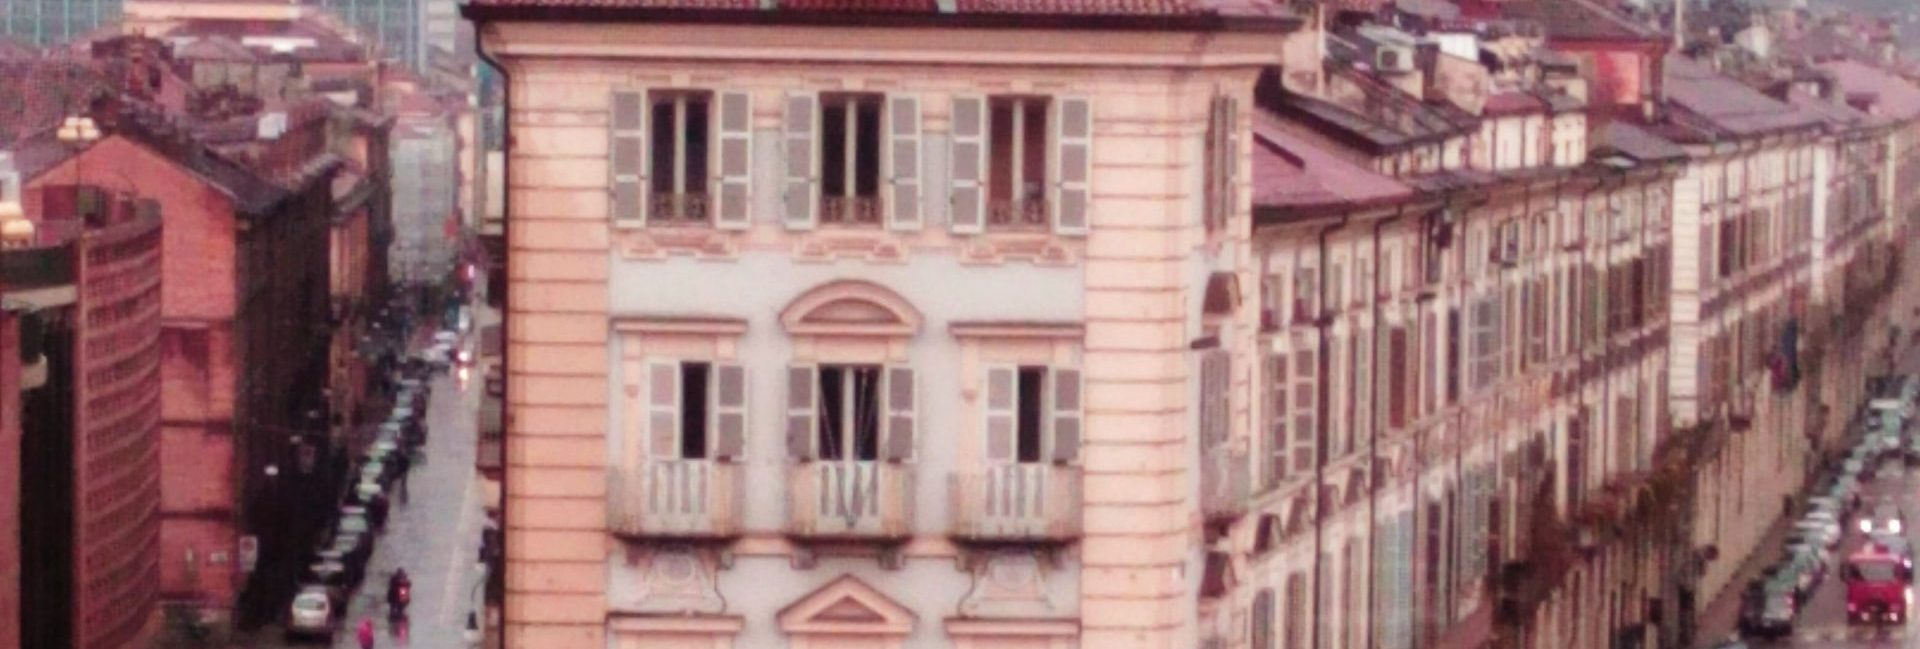 Torino - veduta da una finestra di Palazzo Madama